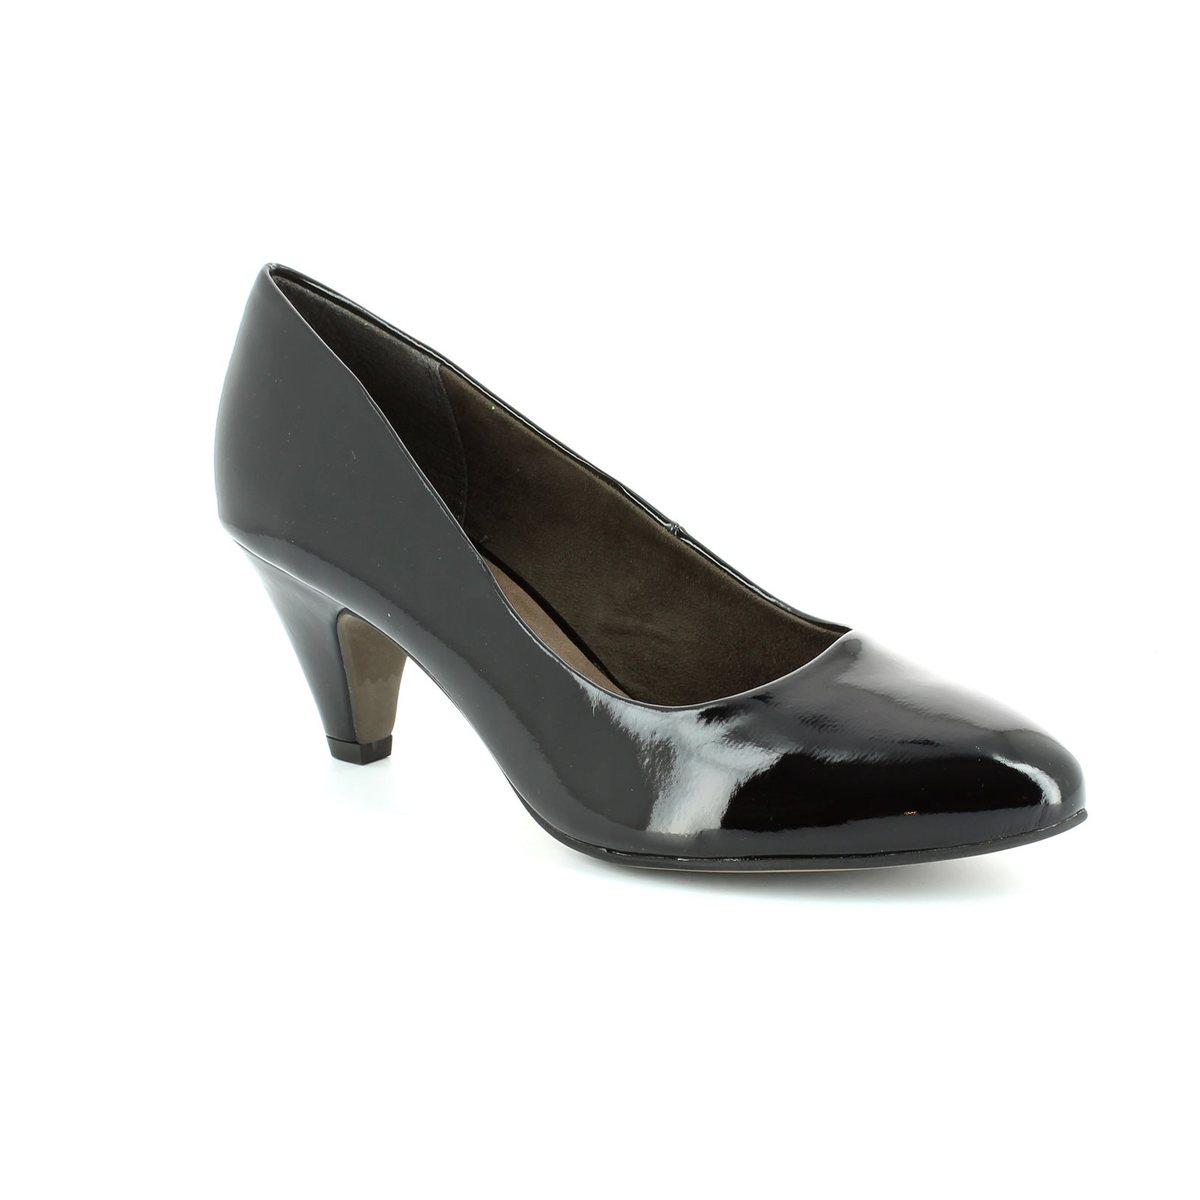 tamaris cressco 22416 018 black patent high heeled shoes. Black Bedroom Furniture Sets. Home Design Ideas